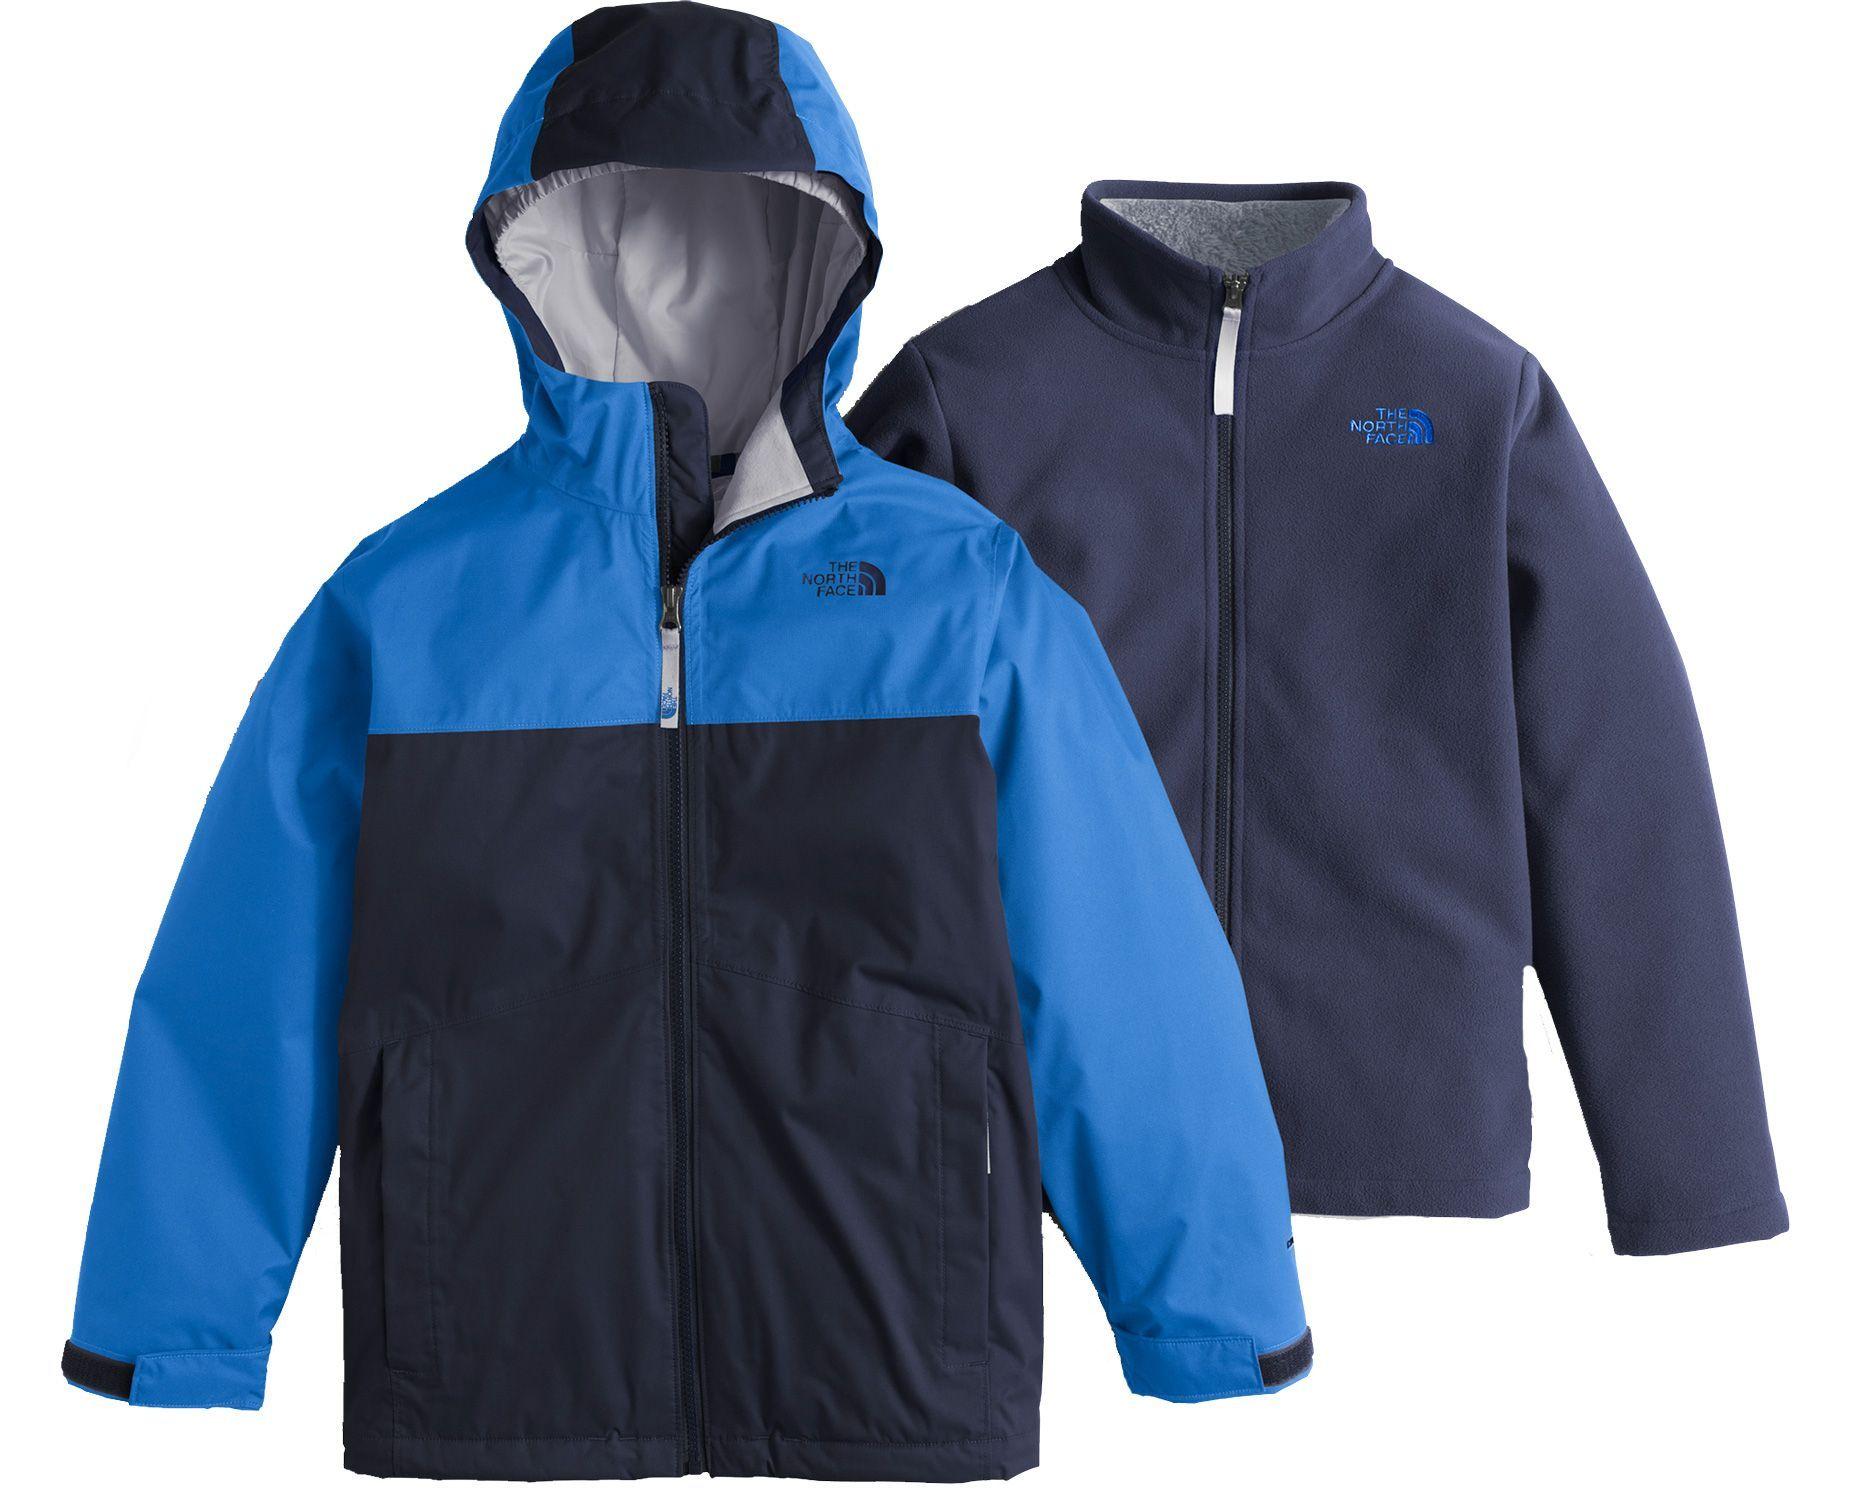 6c1ec61e189d The North Face Boys  Chimborazo 3-in-1 Jacket